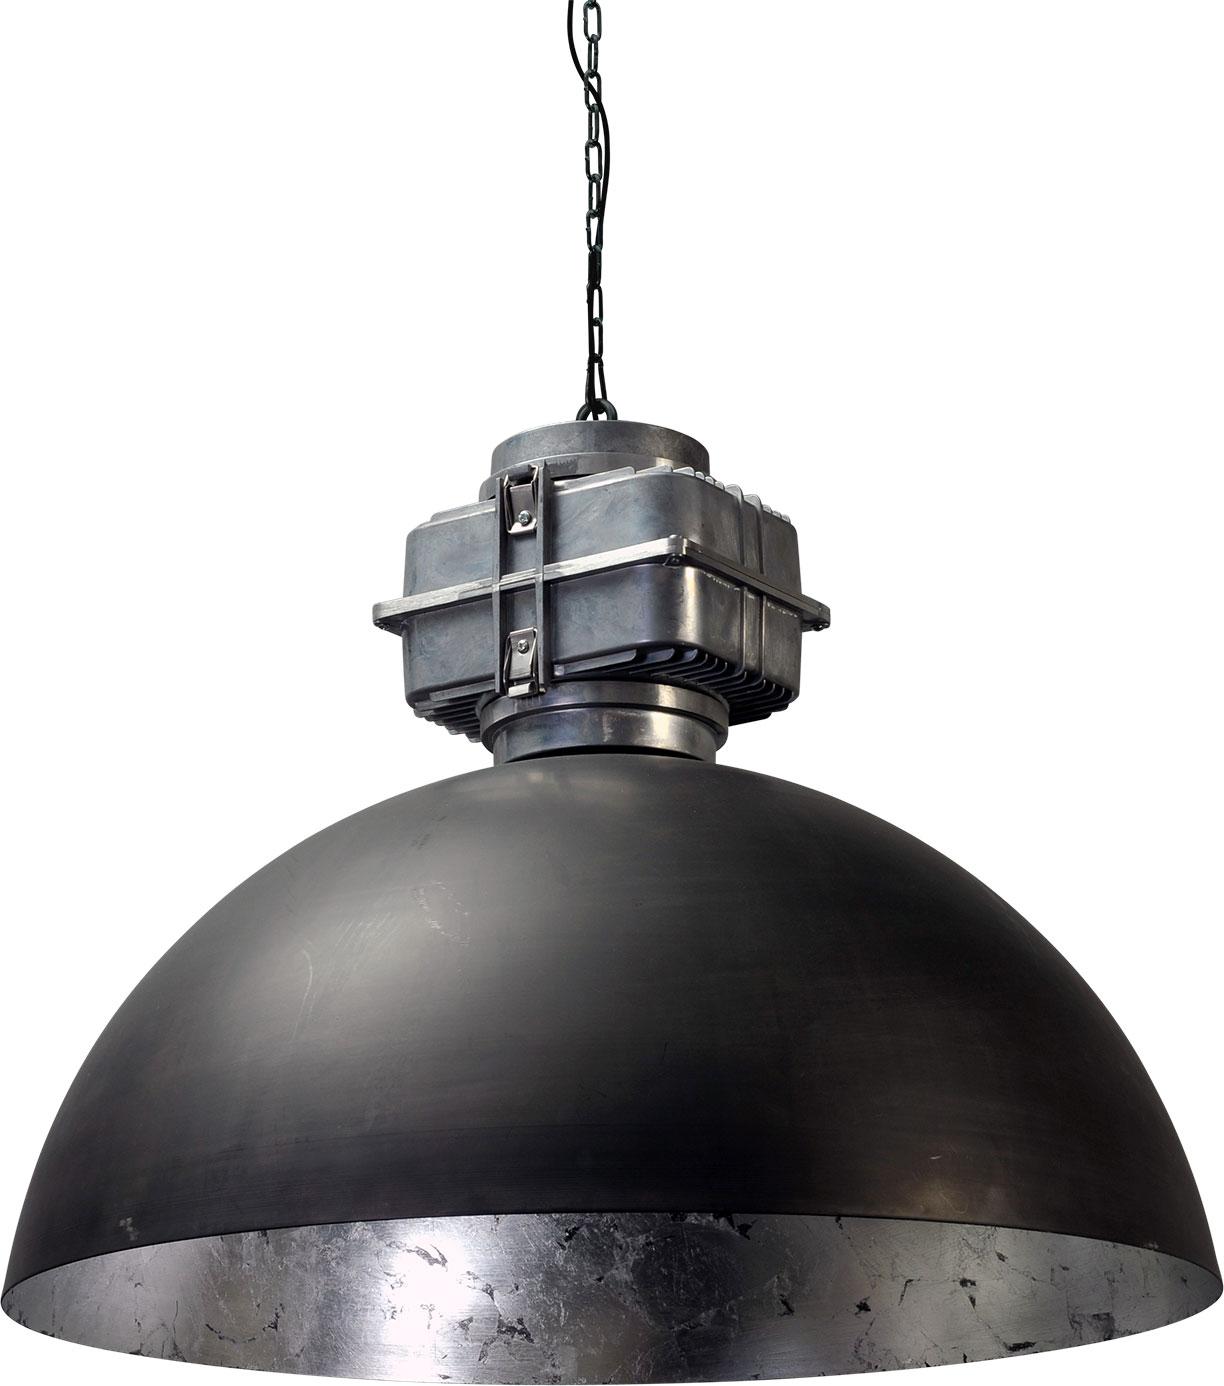 larino 2201 30 37 BL - Lamp Larino Motorblok Gunmetal